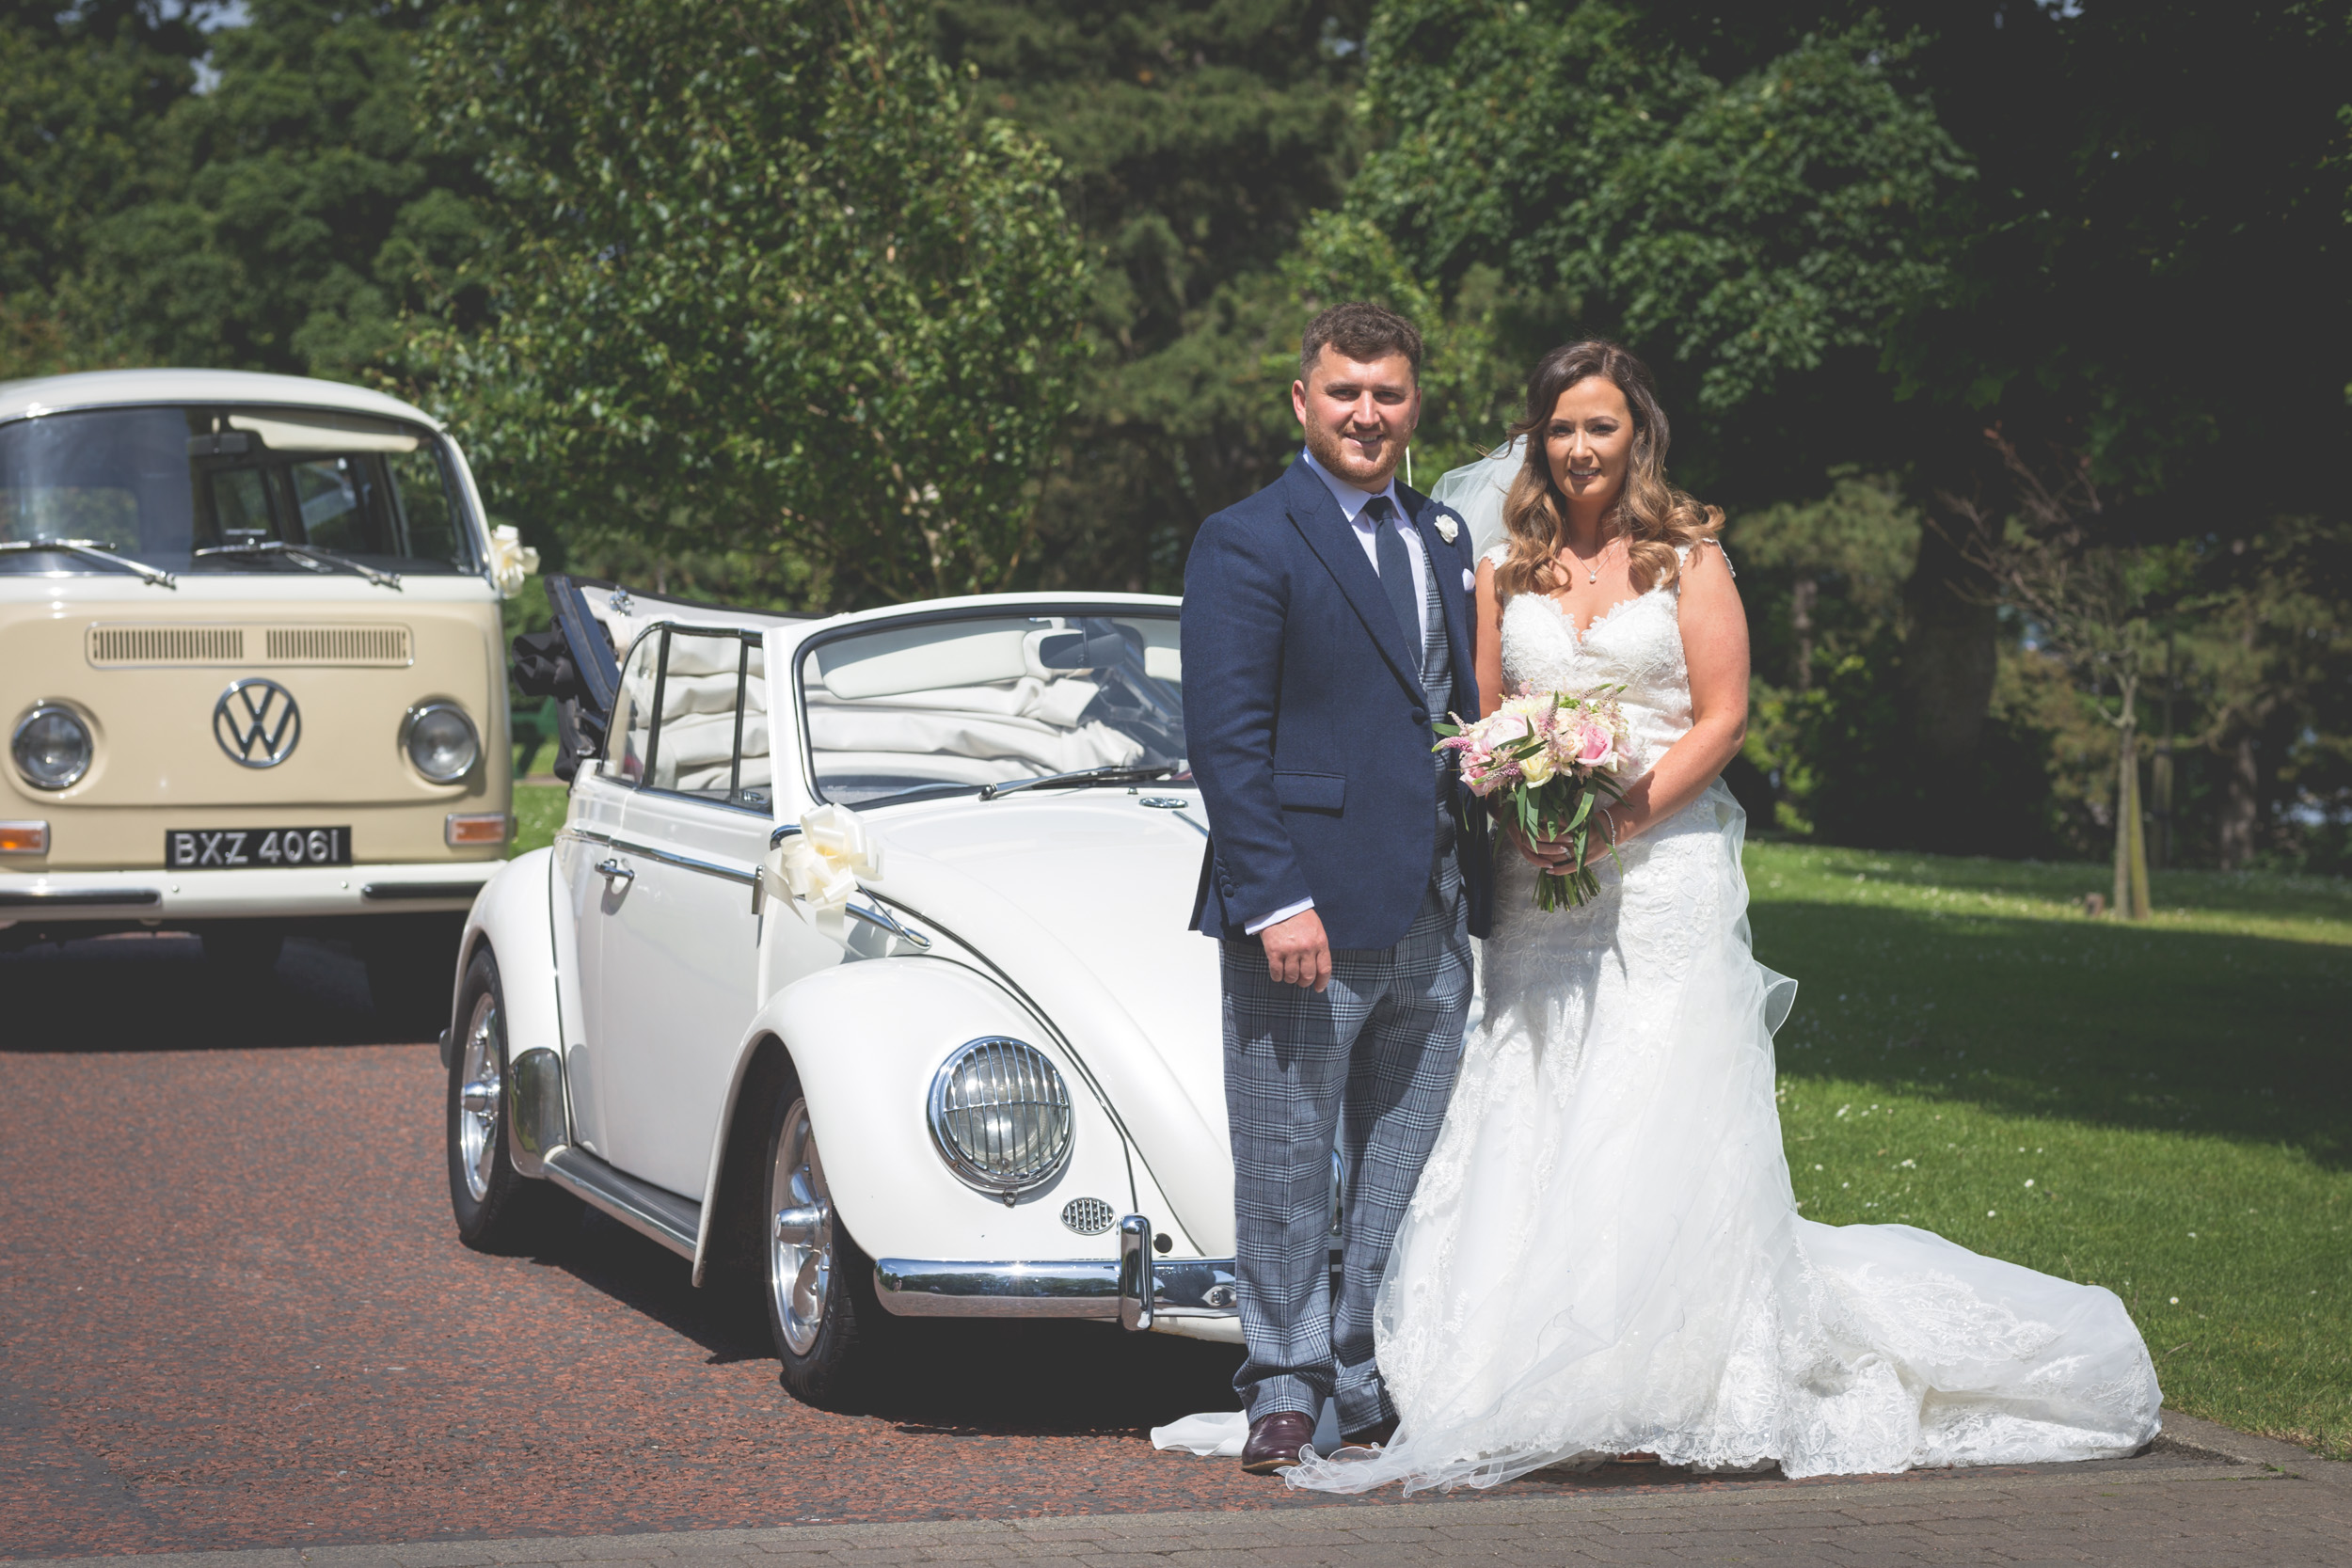 Brian McEwan   Northern Ireland Wedding Photographer   Rebecca & Michael   Portraits-13.jpg